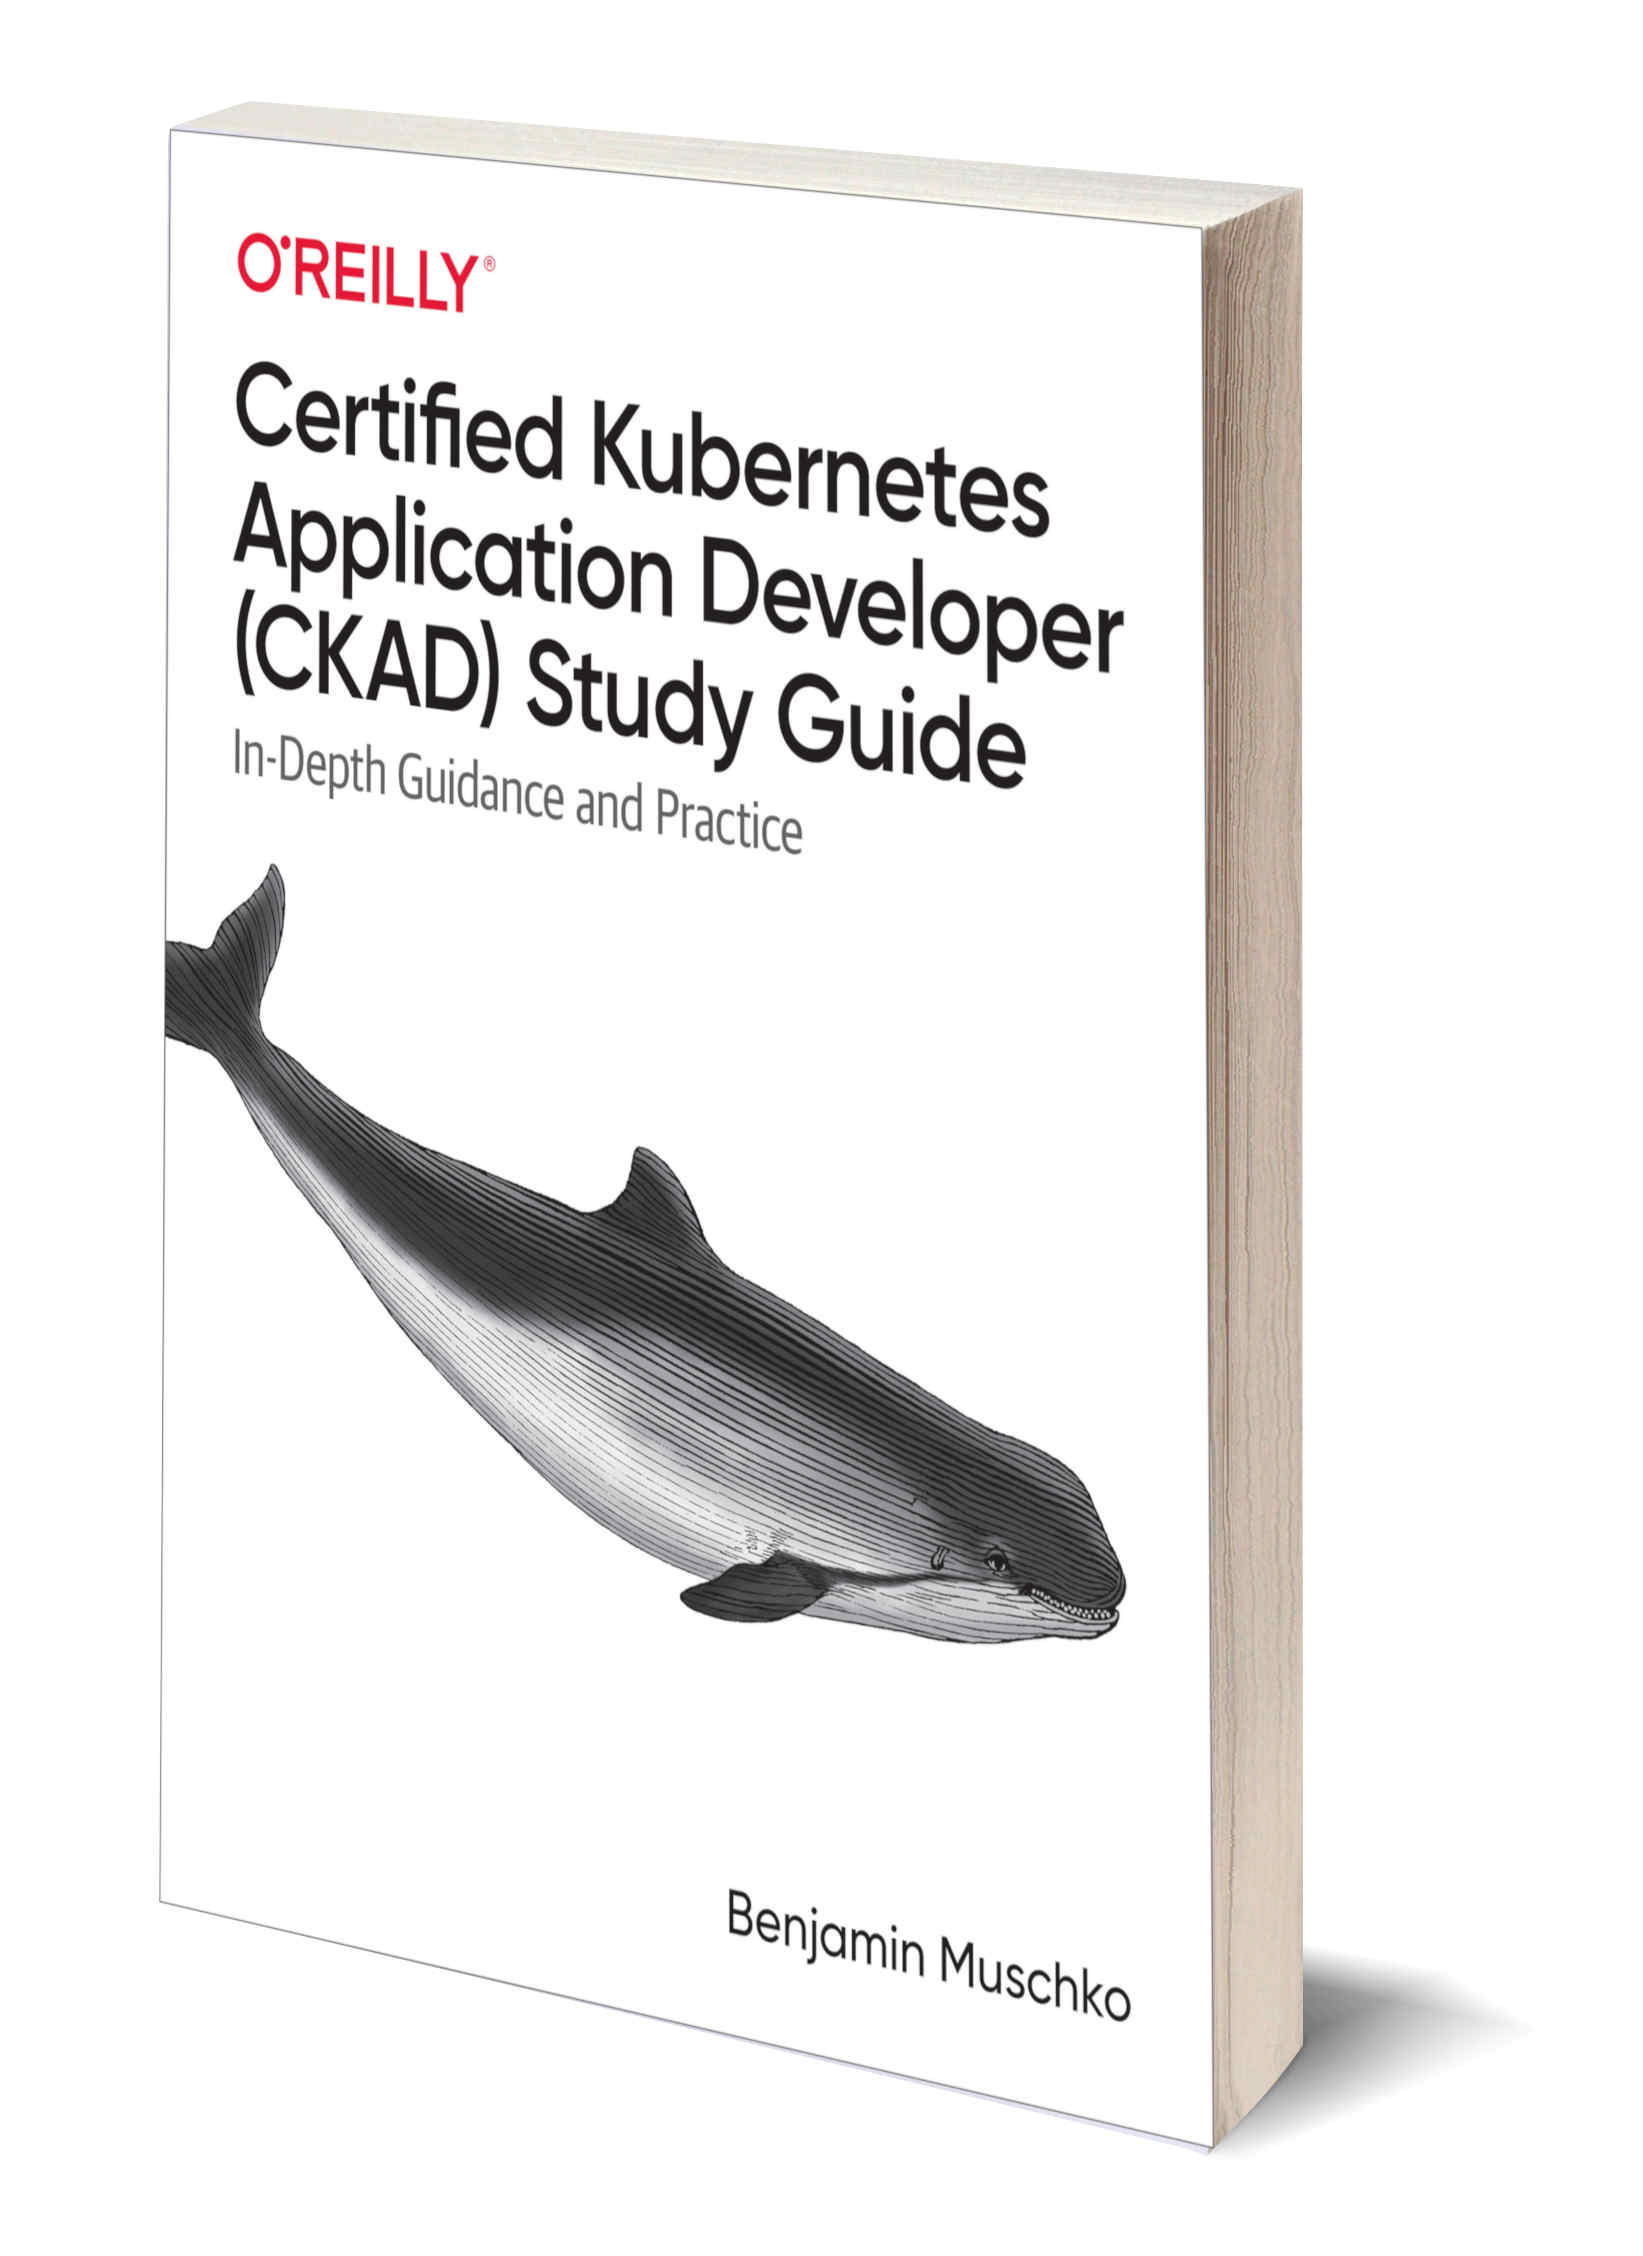 Certified Kubernetes Application Developer (CKAD) Study Guide